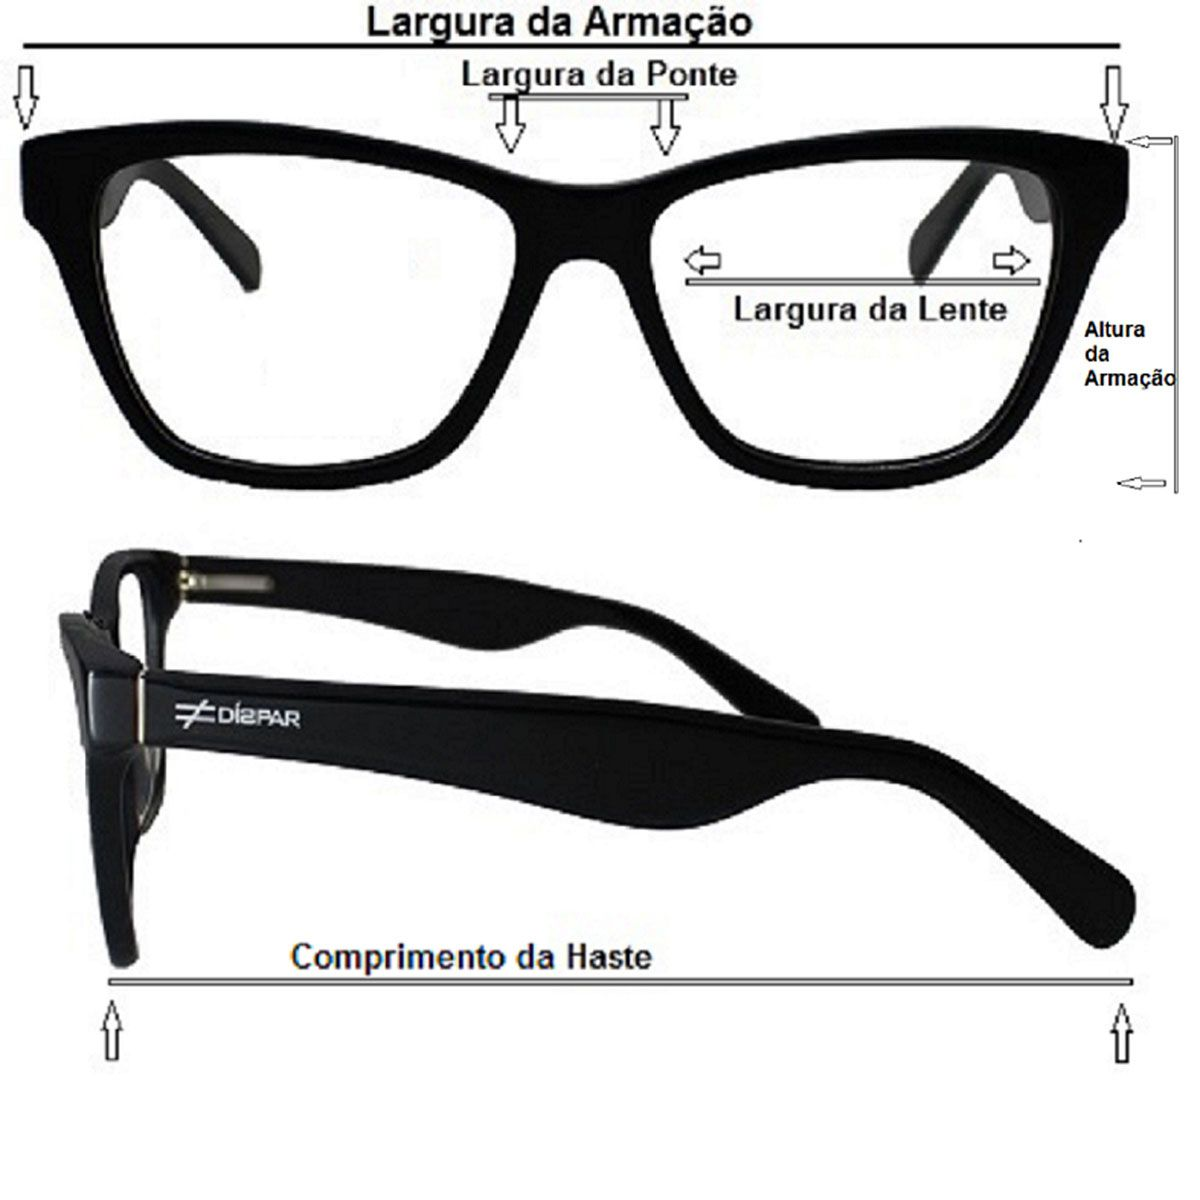 Armação para Óculos Díspar D2111 - Demi